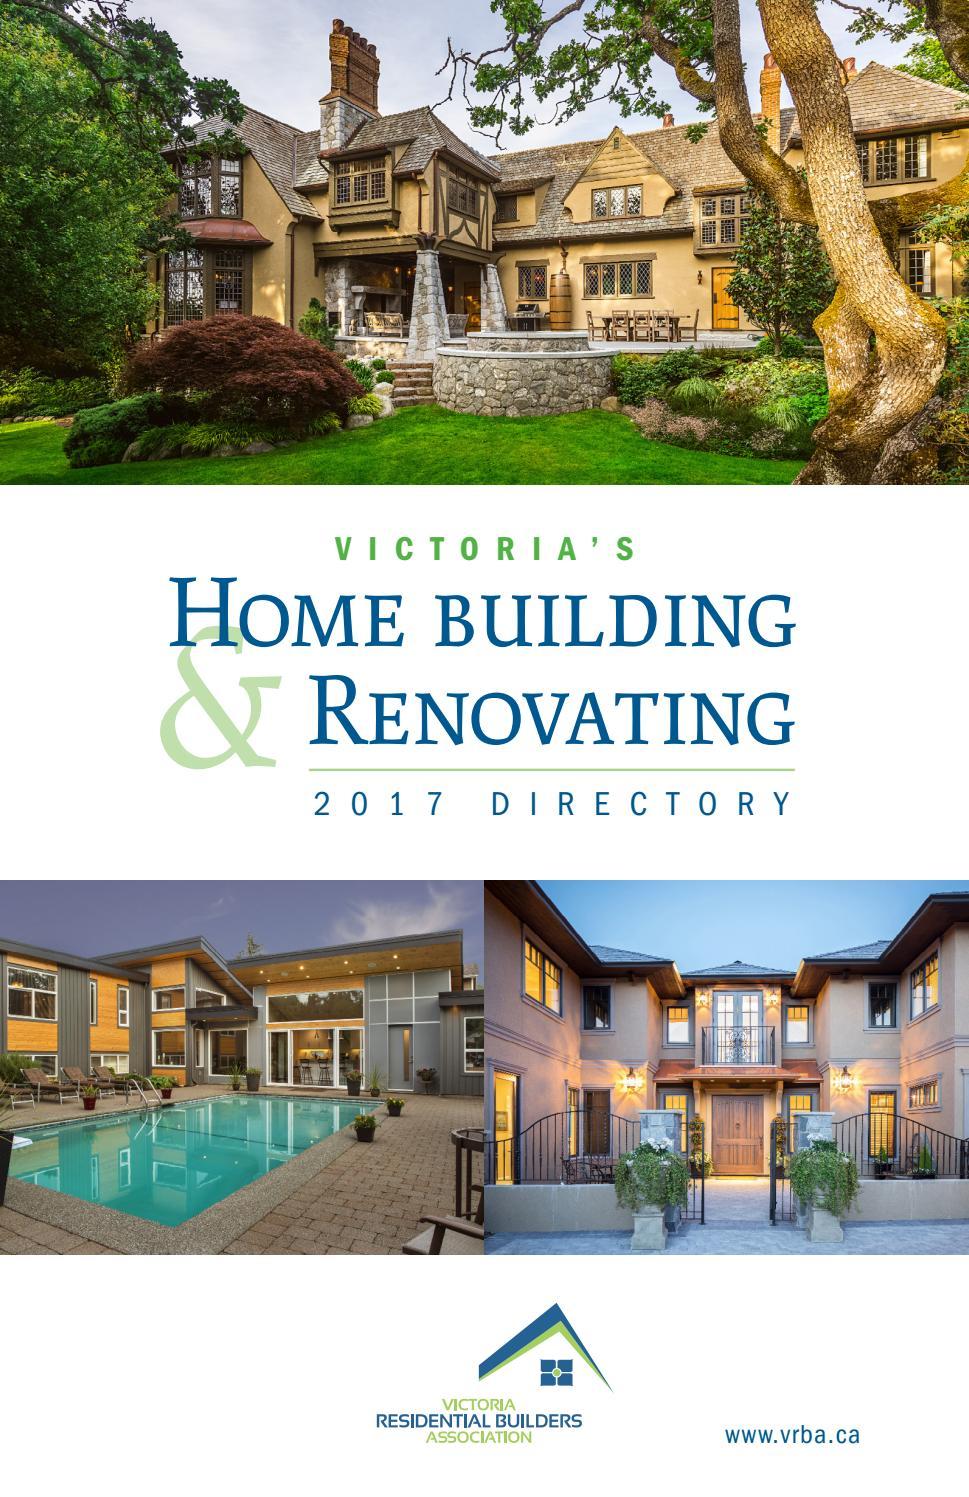 Homebuilding Renovating: Victoria's Home Building & Renovating 2017 Directory By Victoria Residential Builders